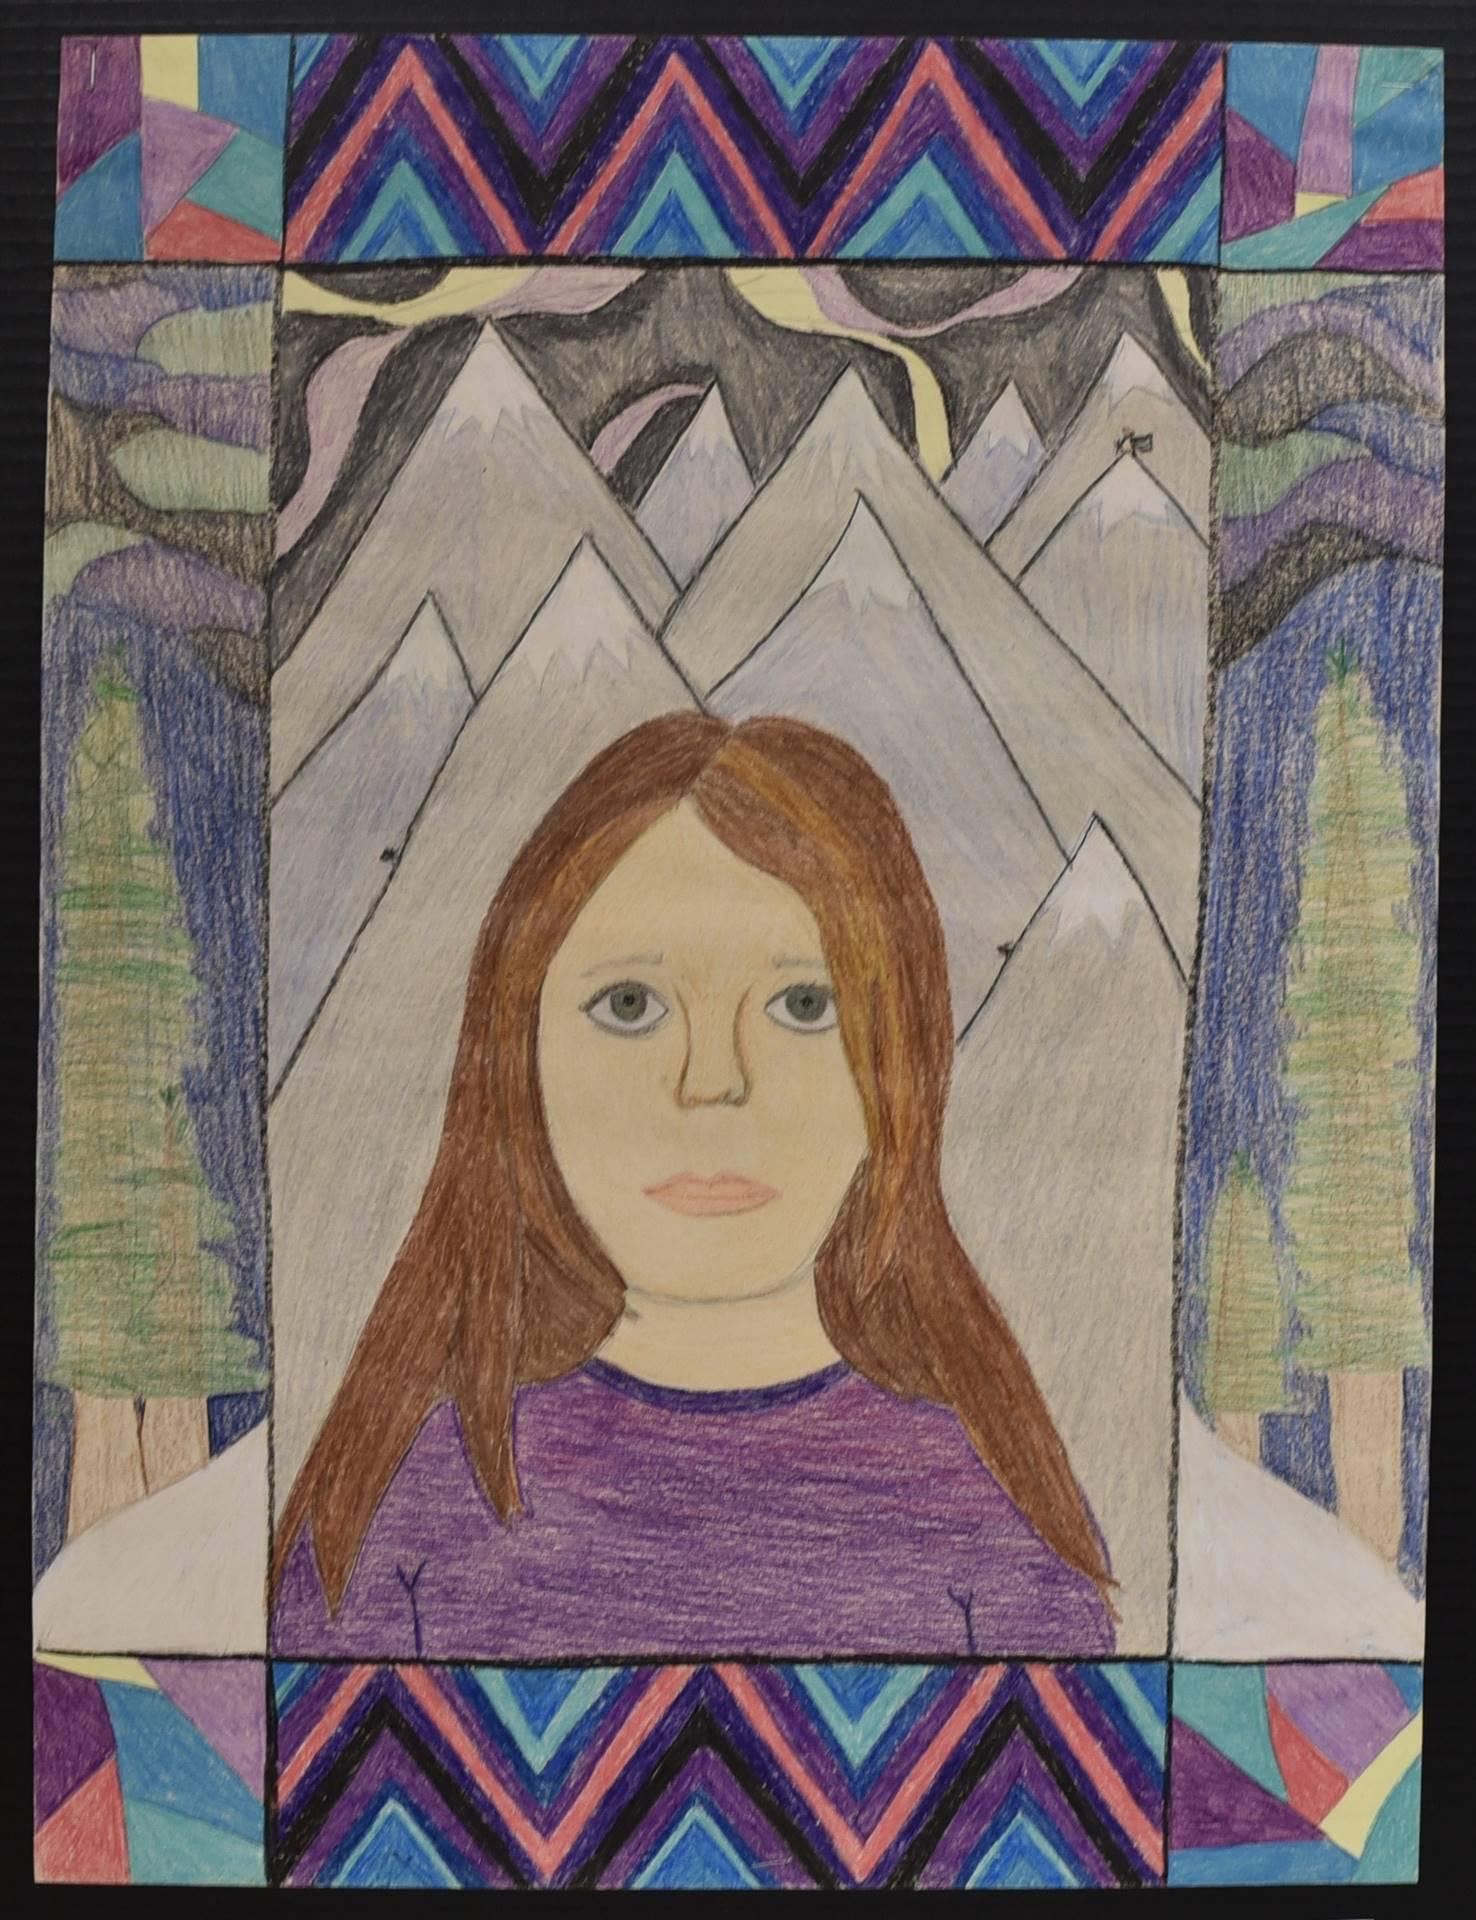 Brecksville-Broadview Hts. Middle School Art Projects 153